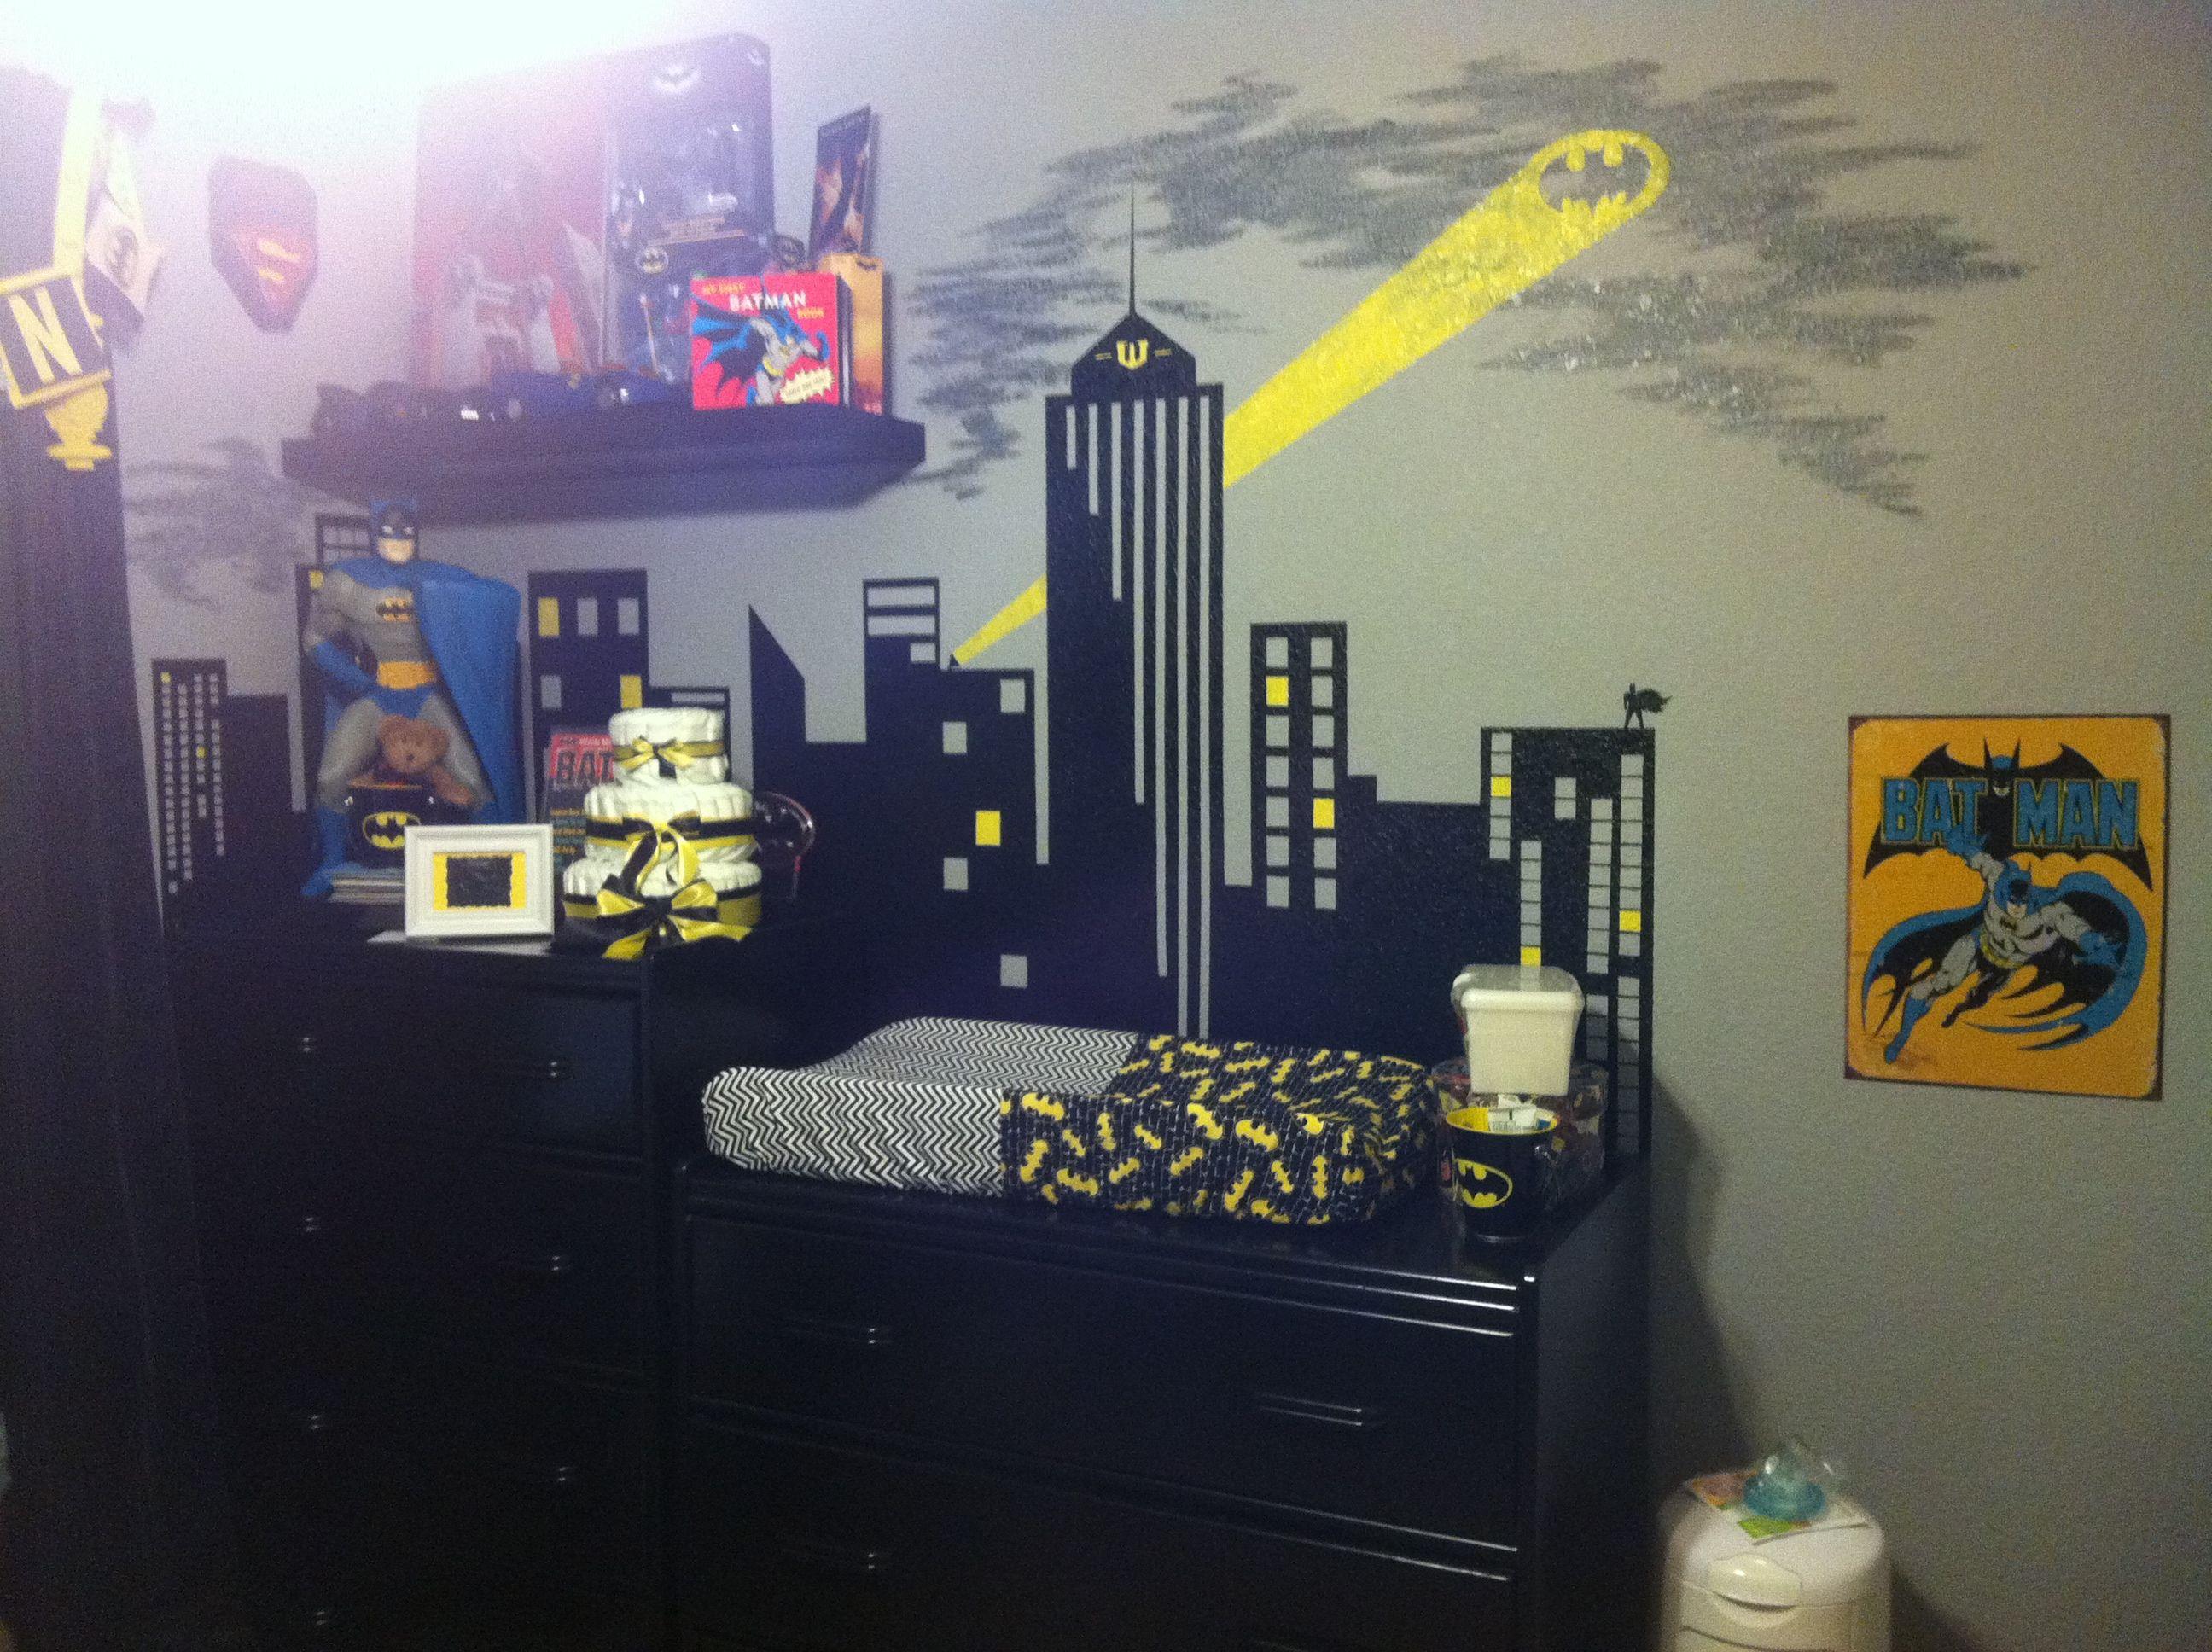 Superhero Boys Room Batman Nursery Print Nursery Prints Batman Room Dccor Boys